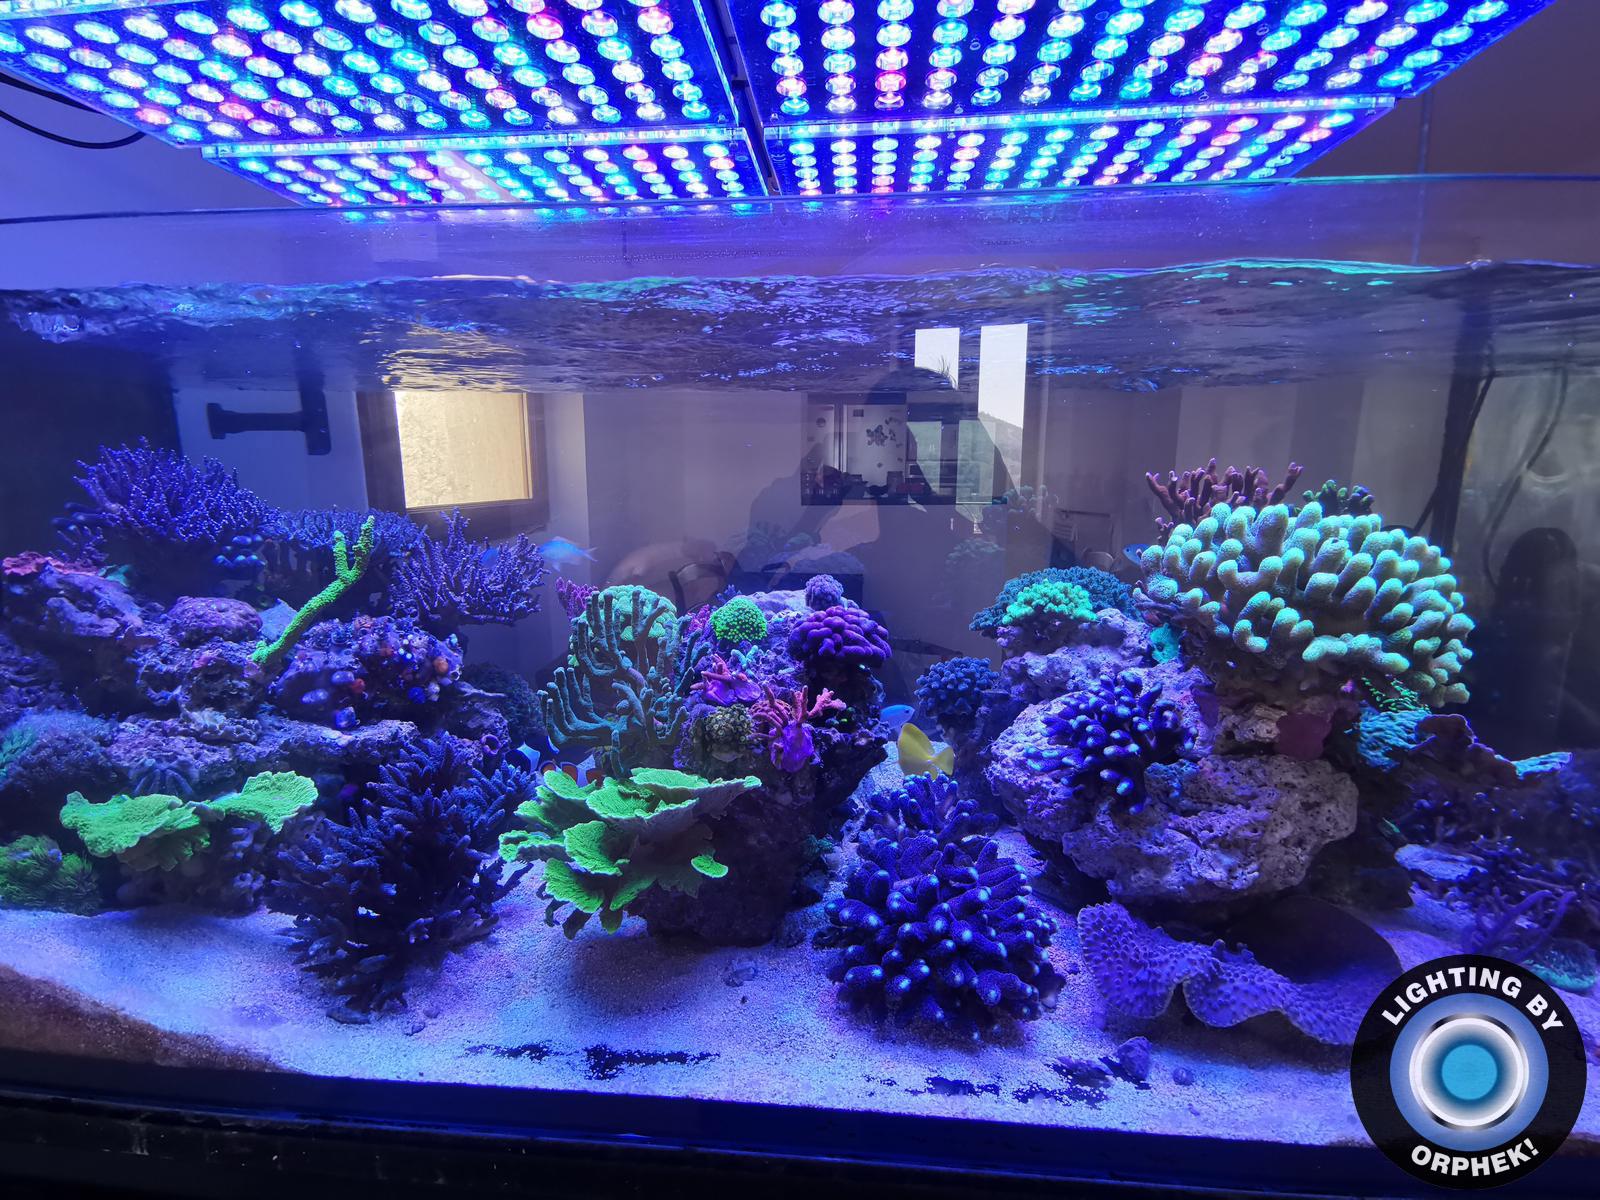 atlantik v4 snest reef aquarium lighting 2020